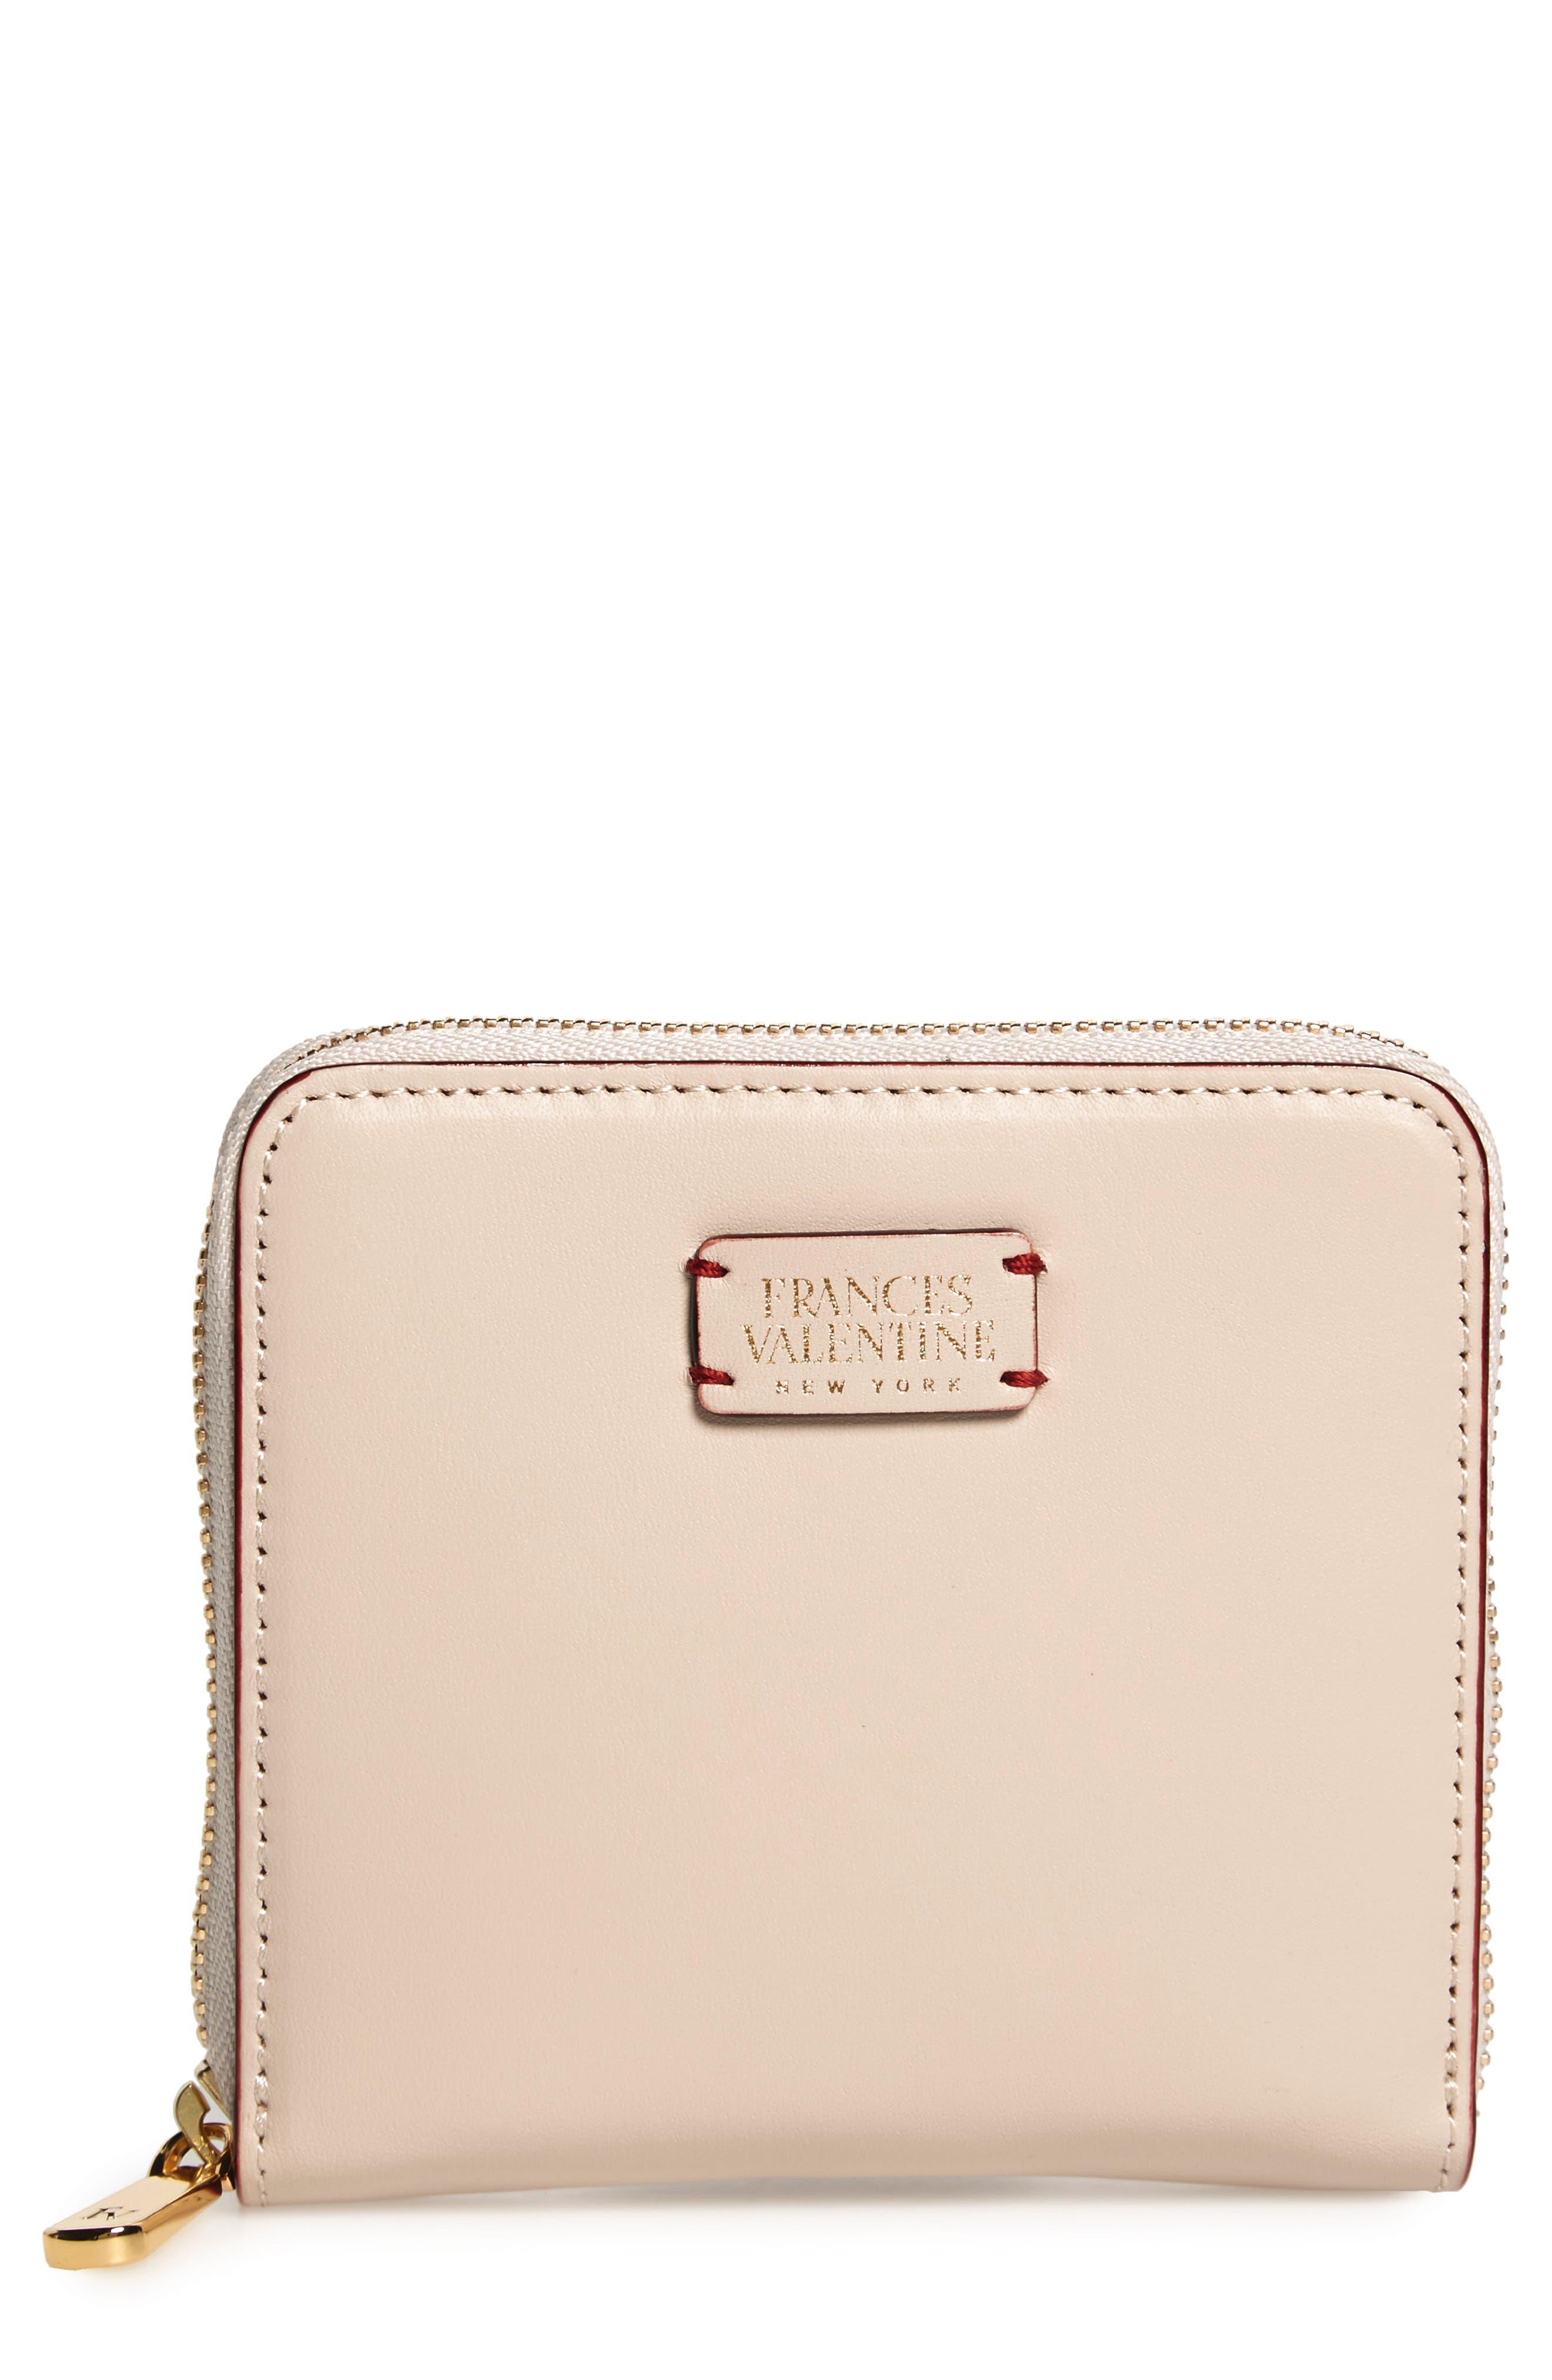 Main Image - Frances Valentine Small Roosevelt Calfskin Leather Wallet